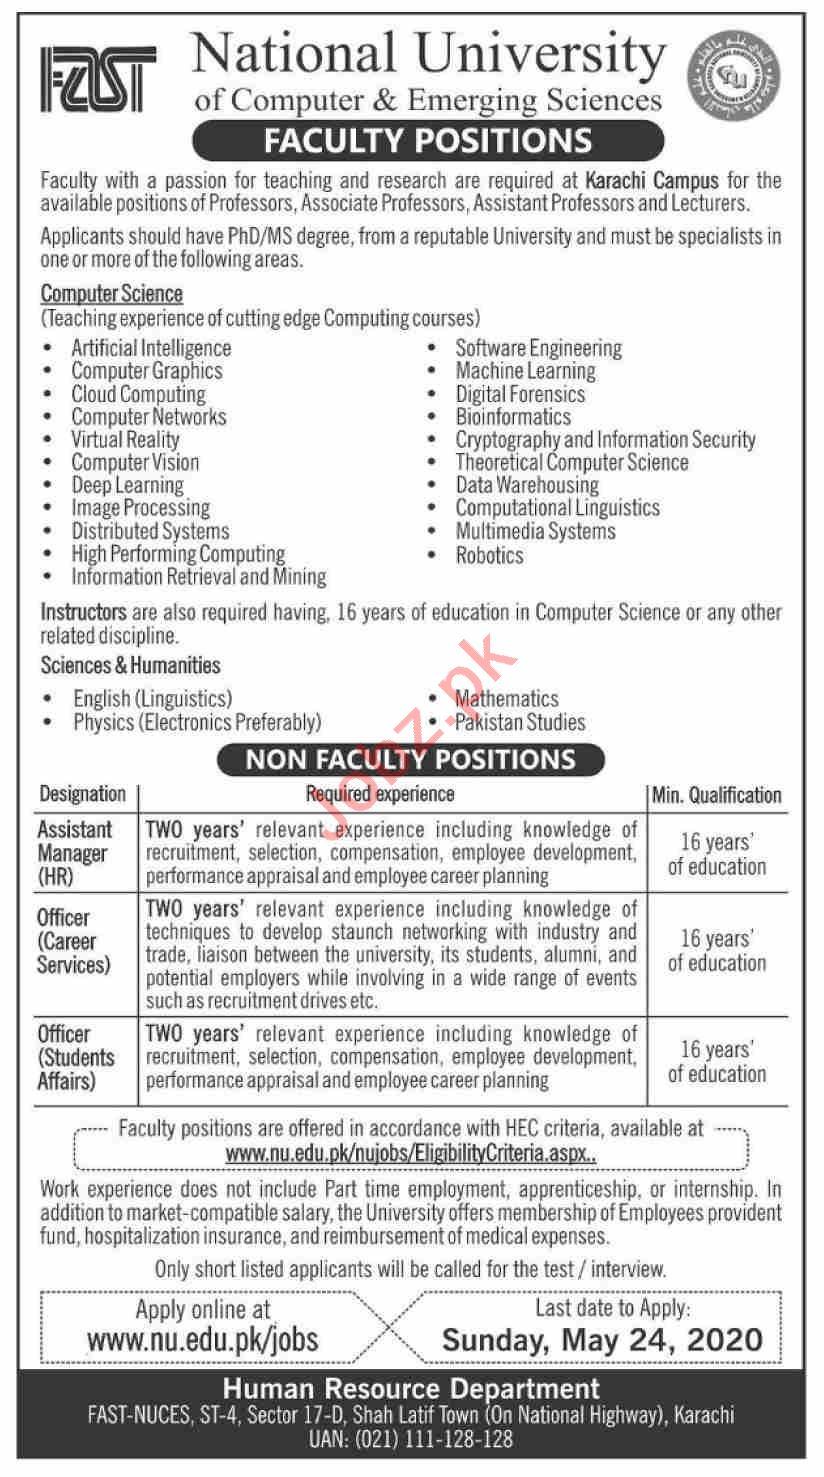 FAST National University of Computer & Emerging Sciences Job